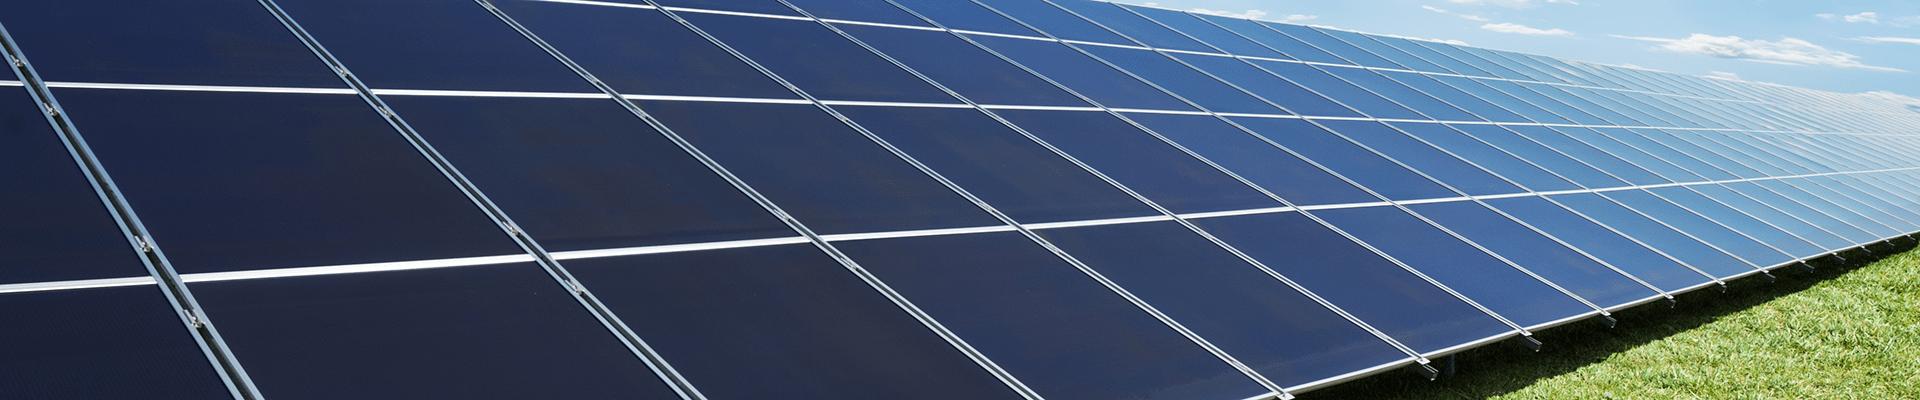 bigstock-Solar-Panels-Row-32373389-min